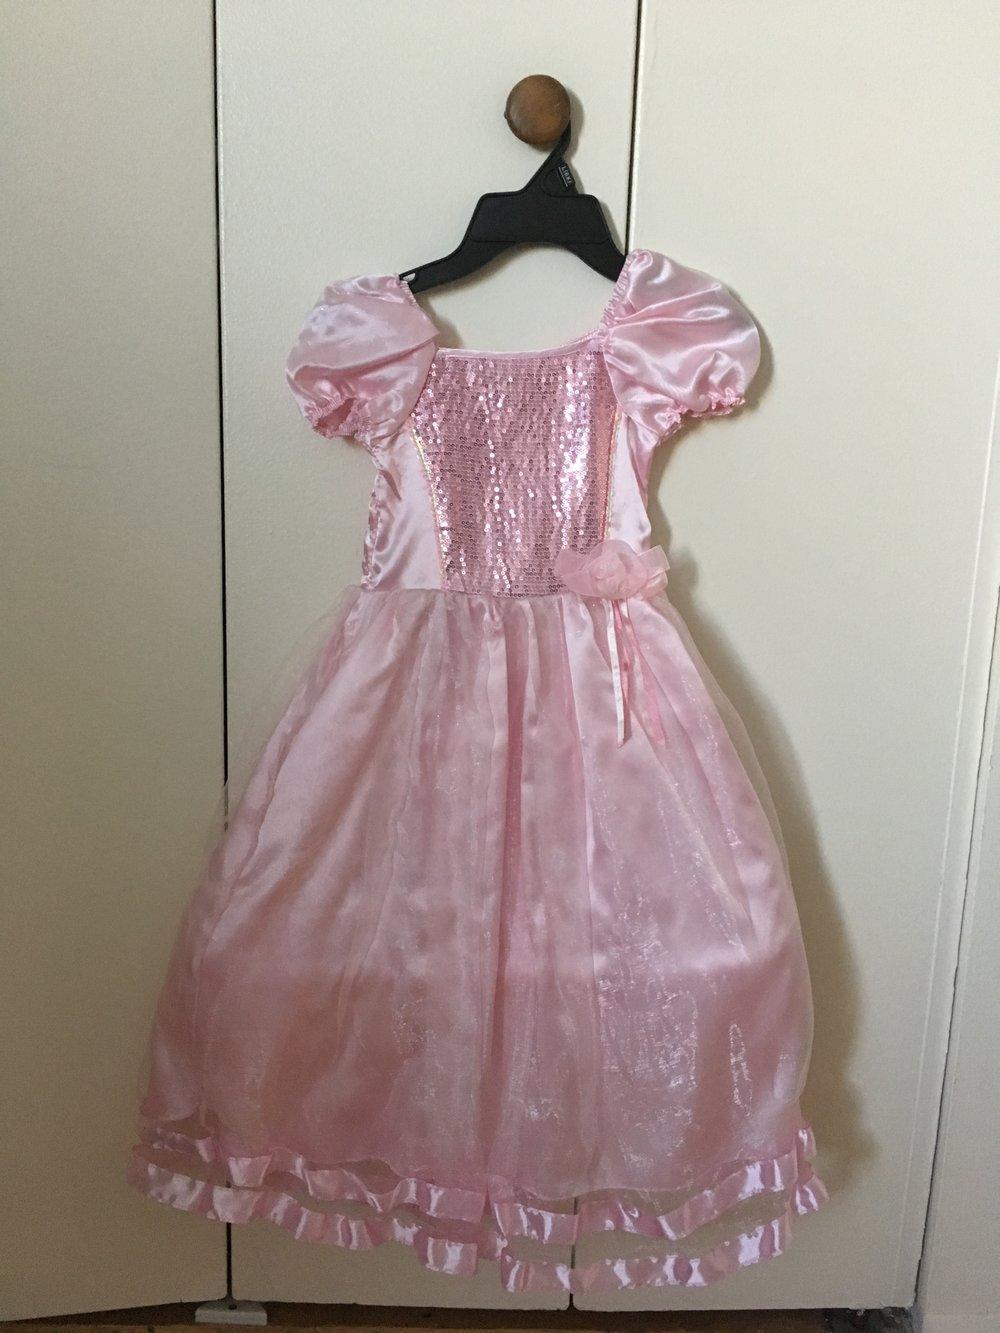 Pink Cinderella Dress $10